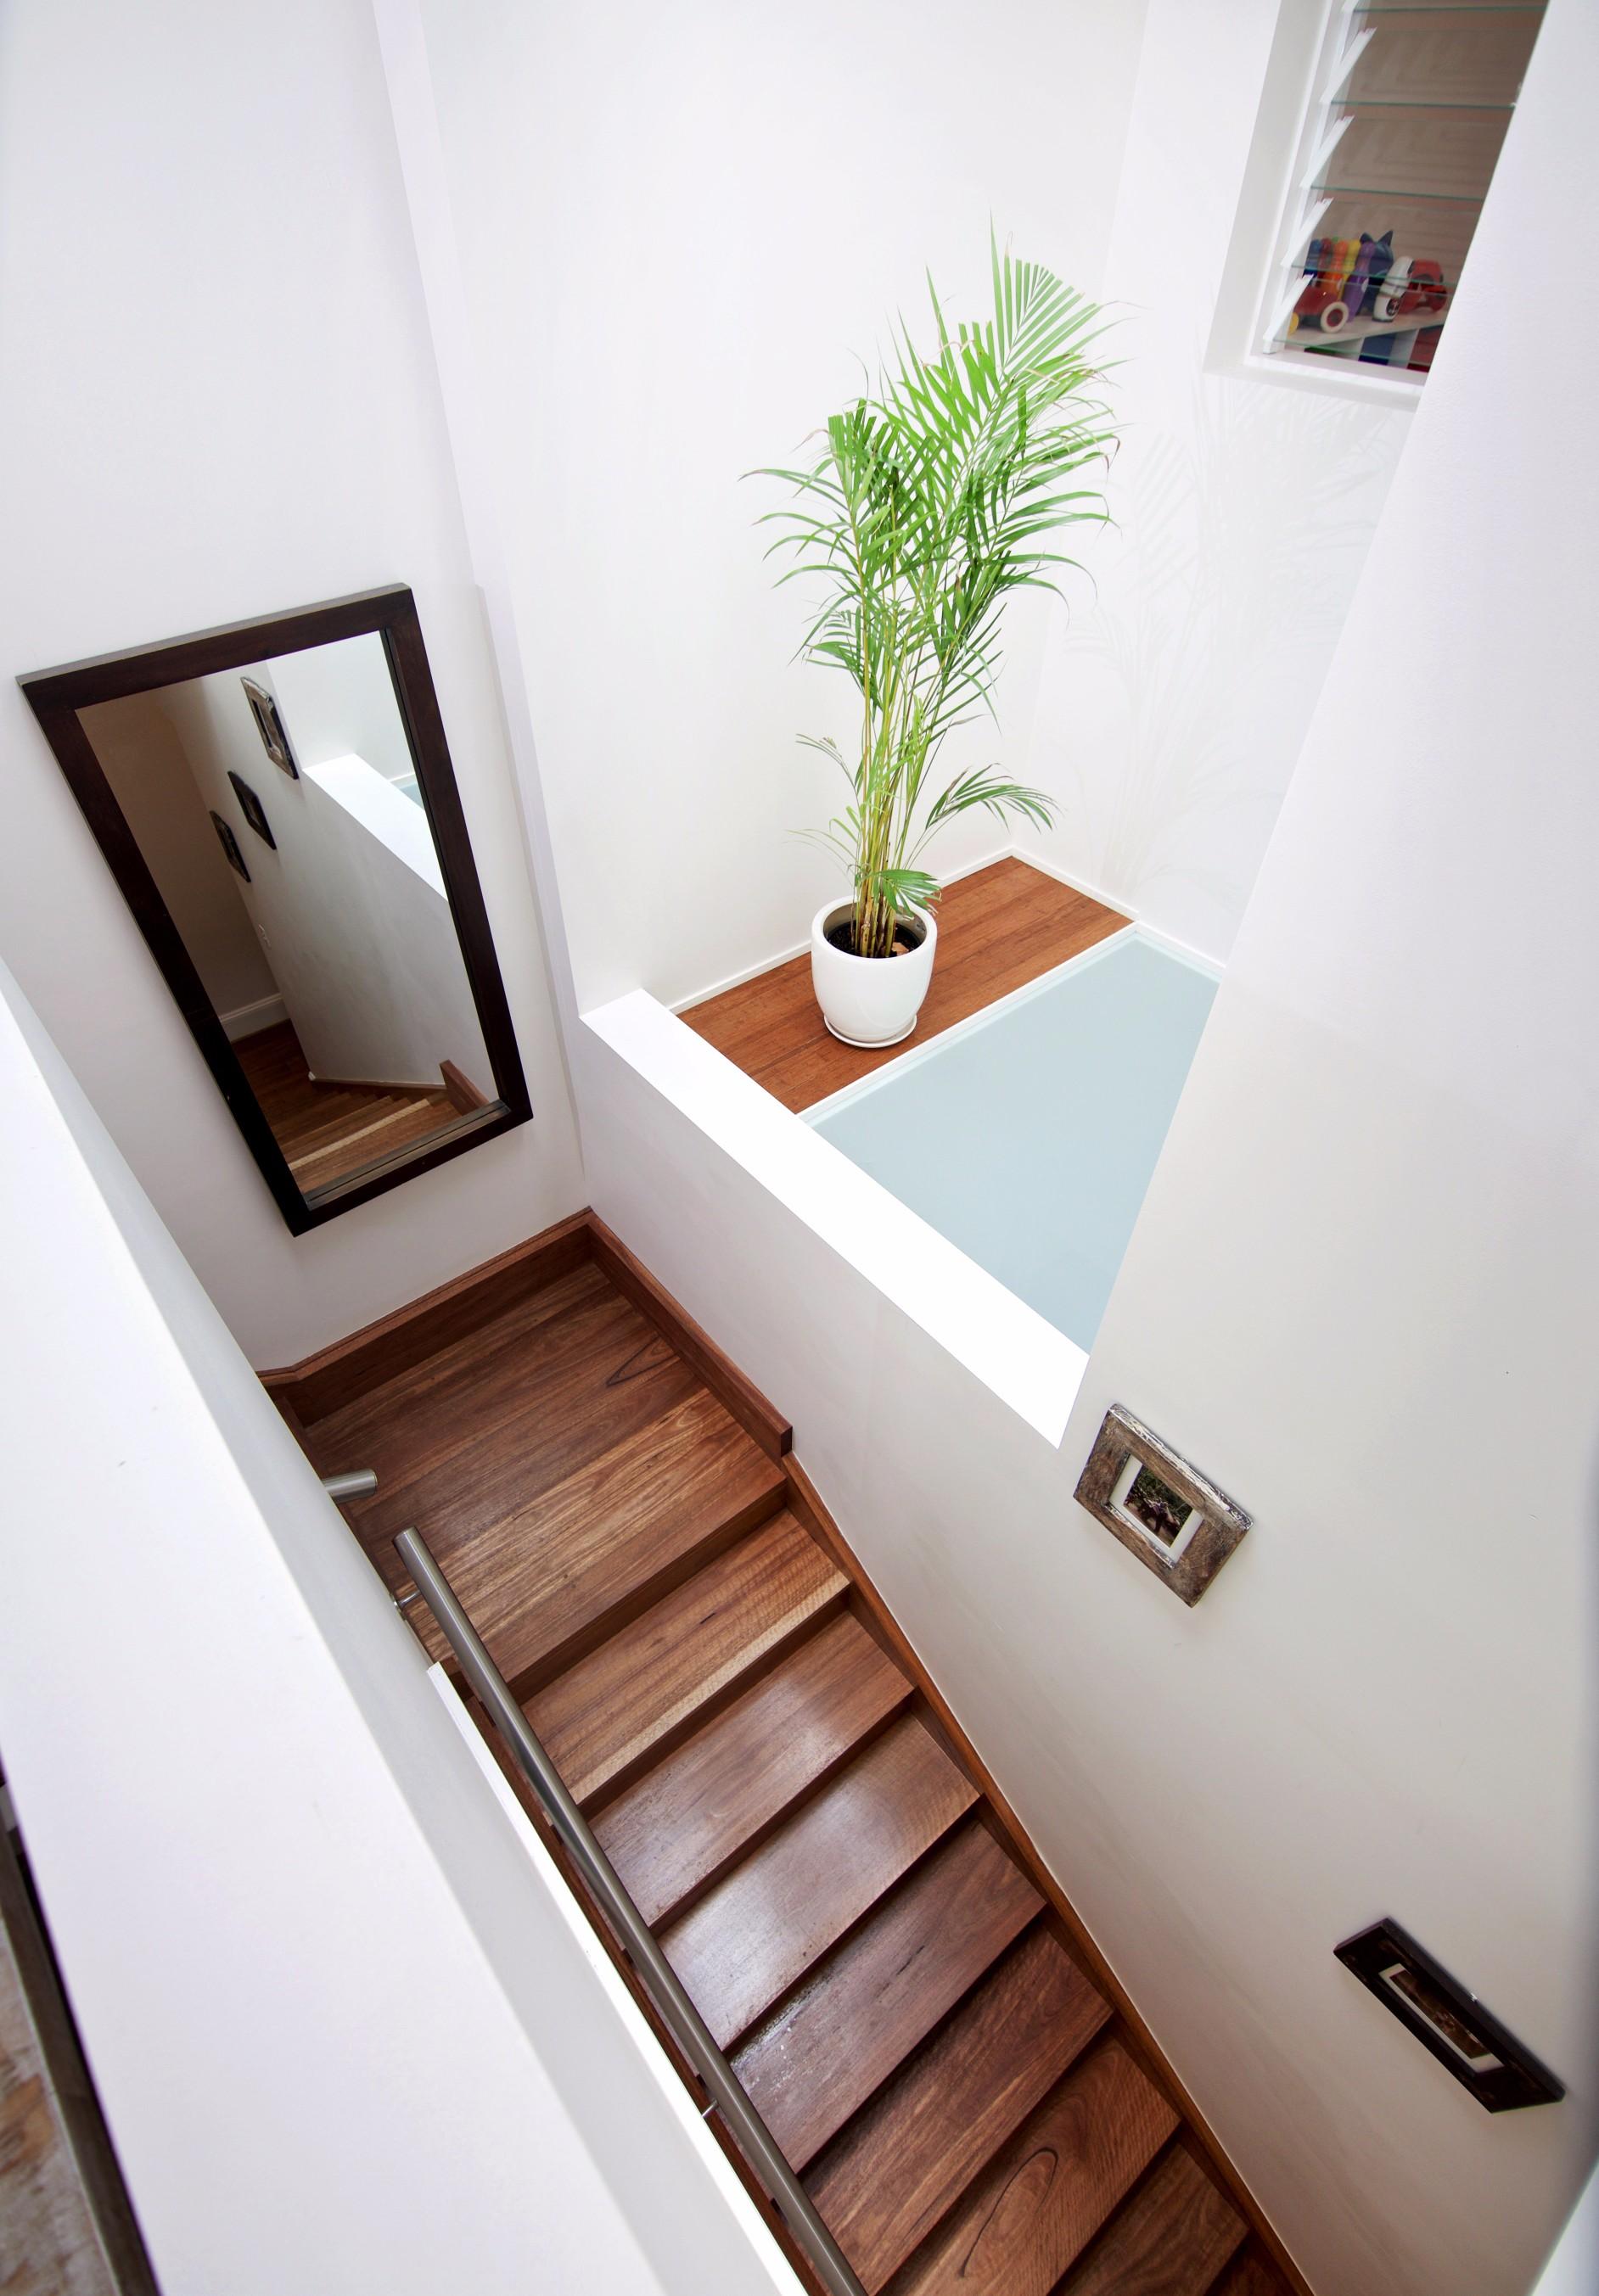 Nvisage_Custom_Design_Homes_Alterations_Additions_Partington4.jpg